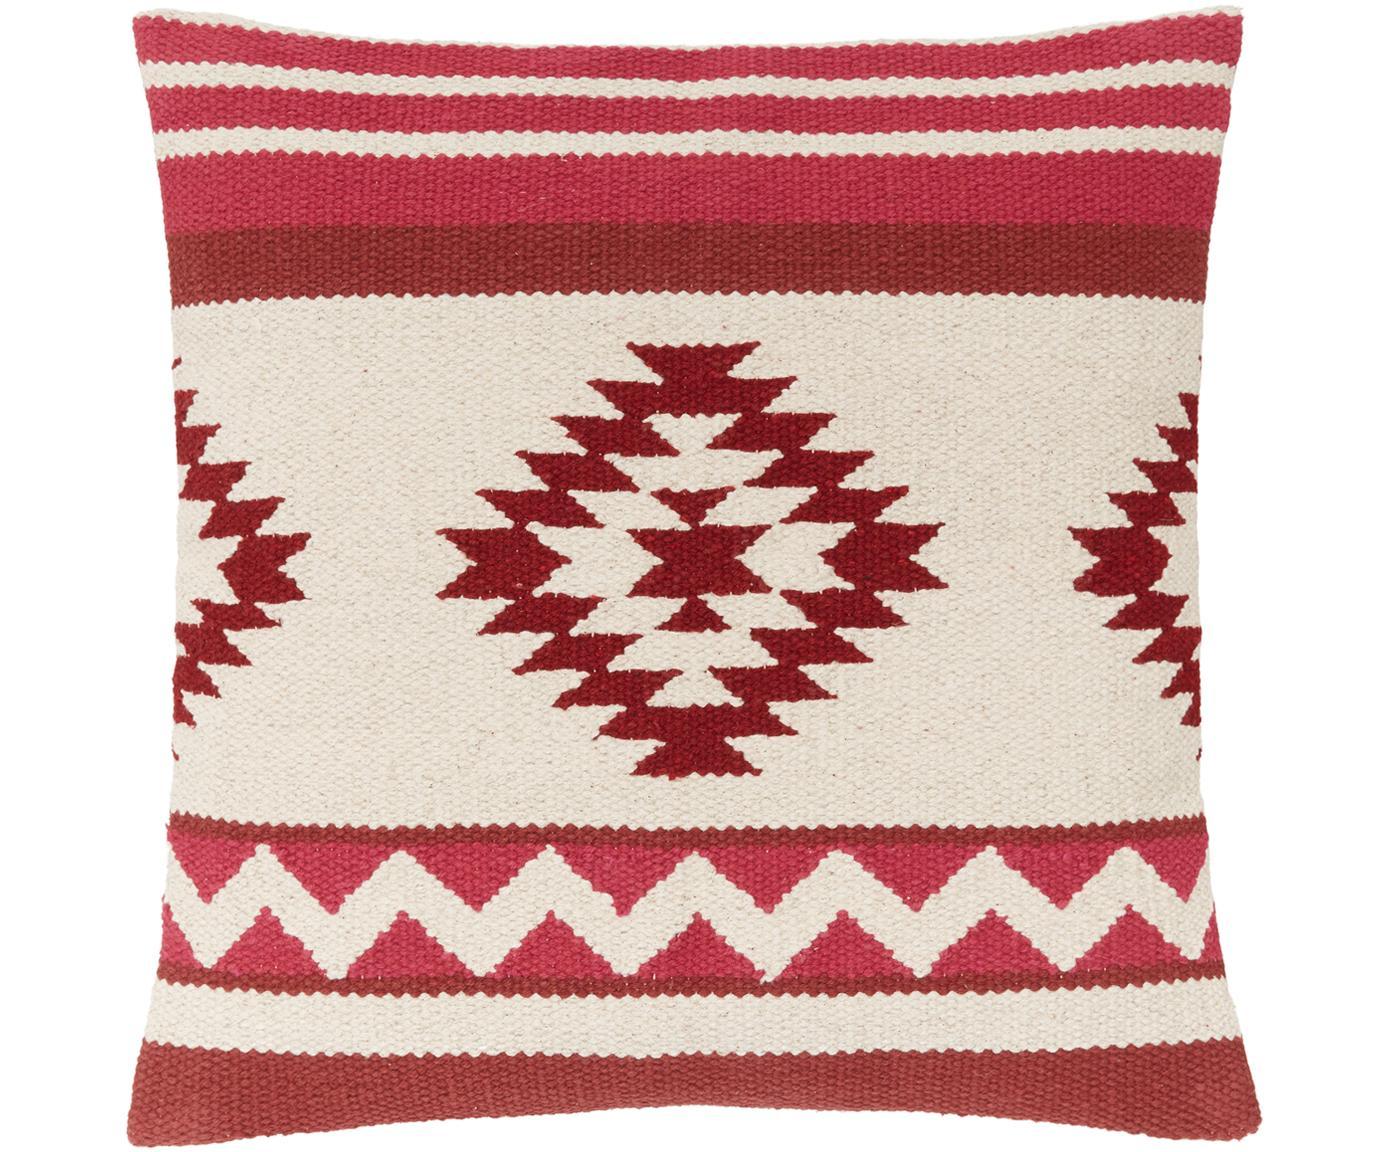 Funda de cojín Tuca, estilo étnico, Algodón, Beige, rojo claro, rojo oscuro, An 45 x L 45 cm